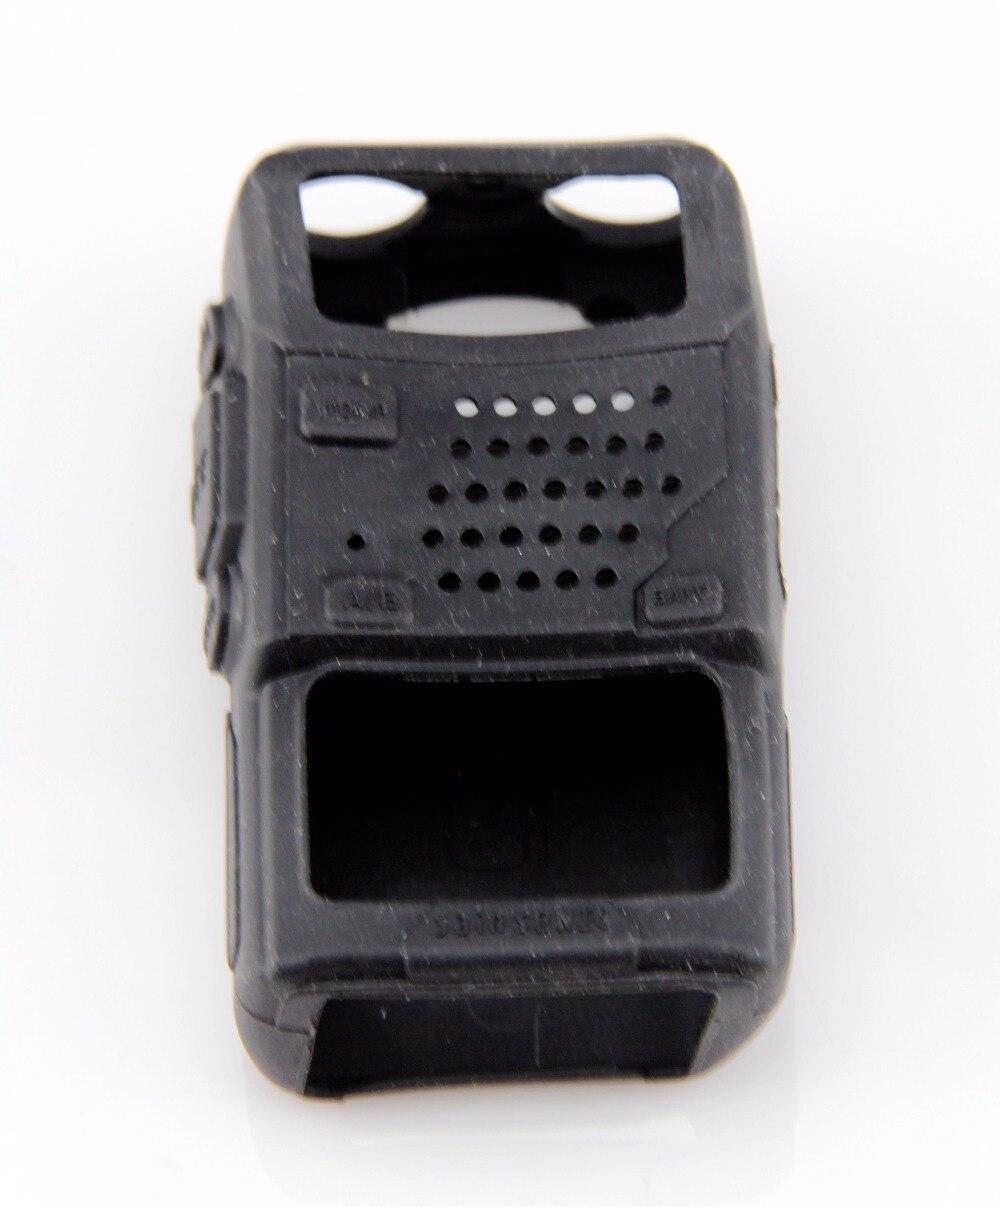 Boîtier-étui en caoutchouc souple pour Radio BAOFENG BF UV-5R UV-5RA UV-5RB UV-5REPlus TF-UV985 TYT TH-F8